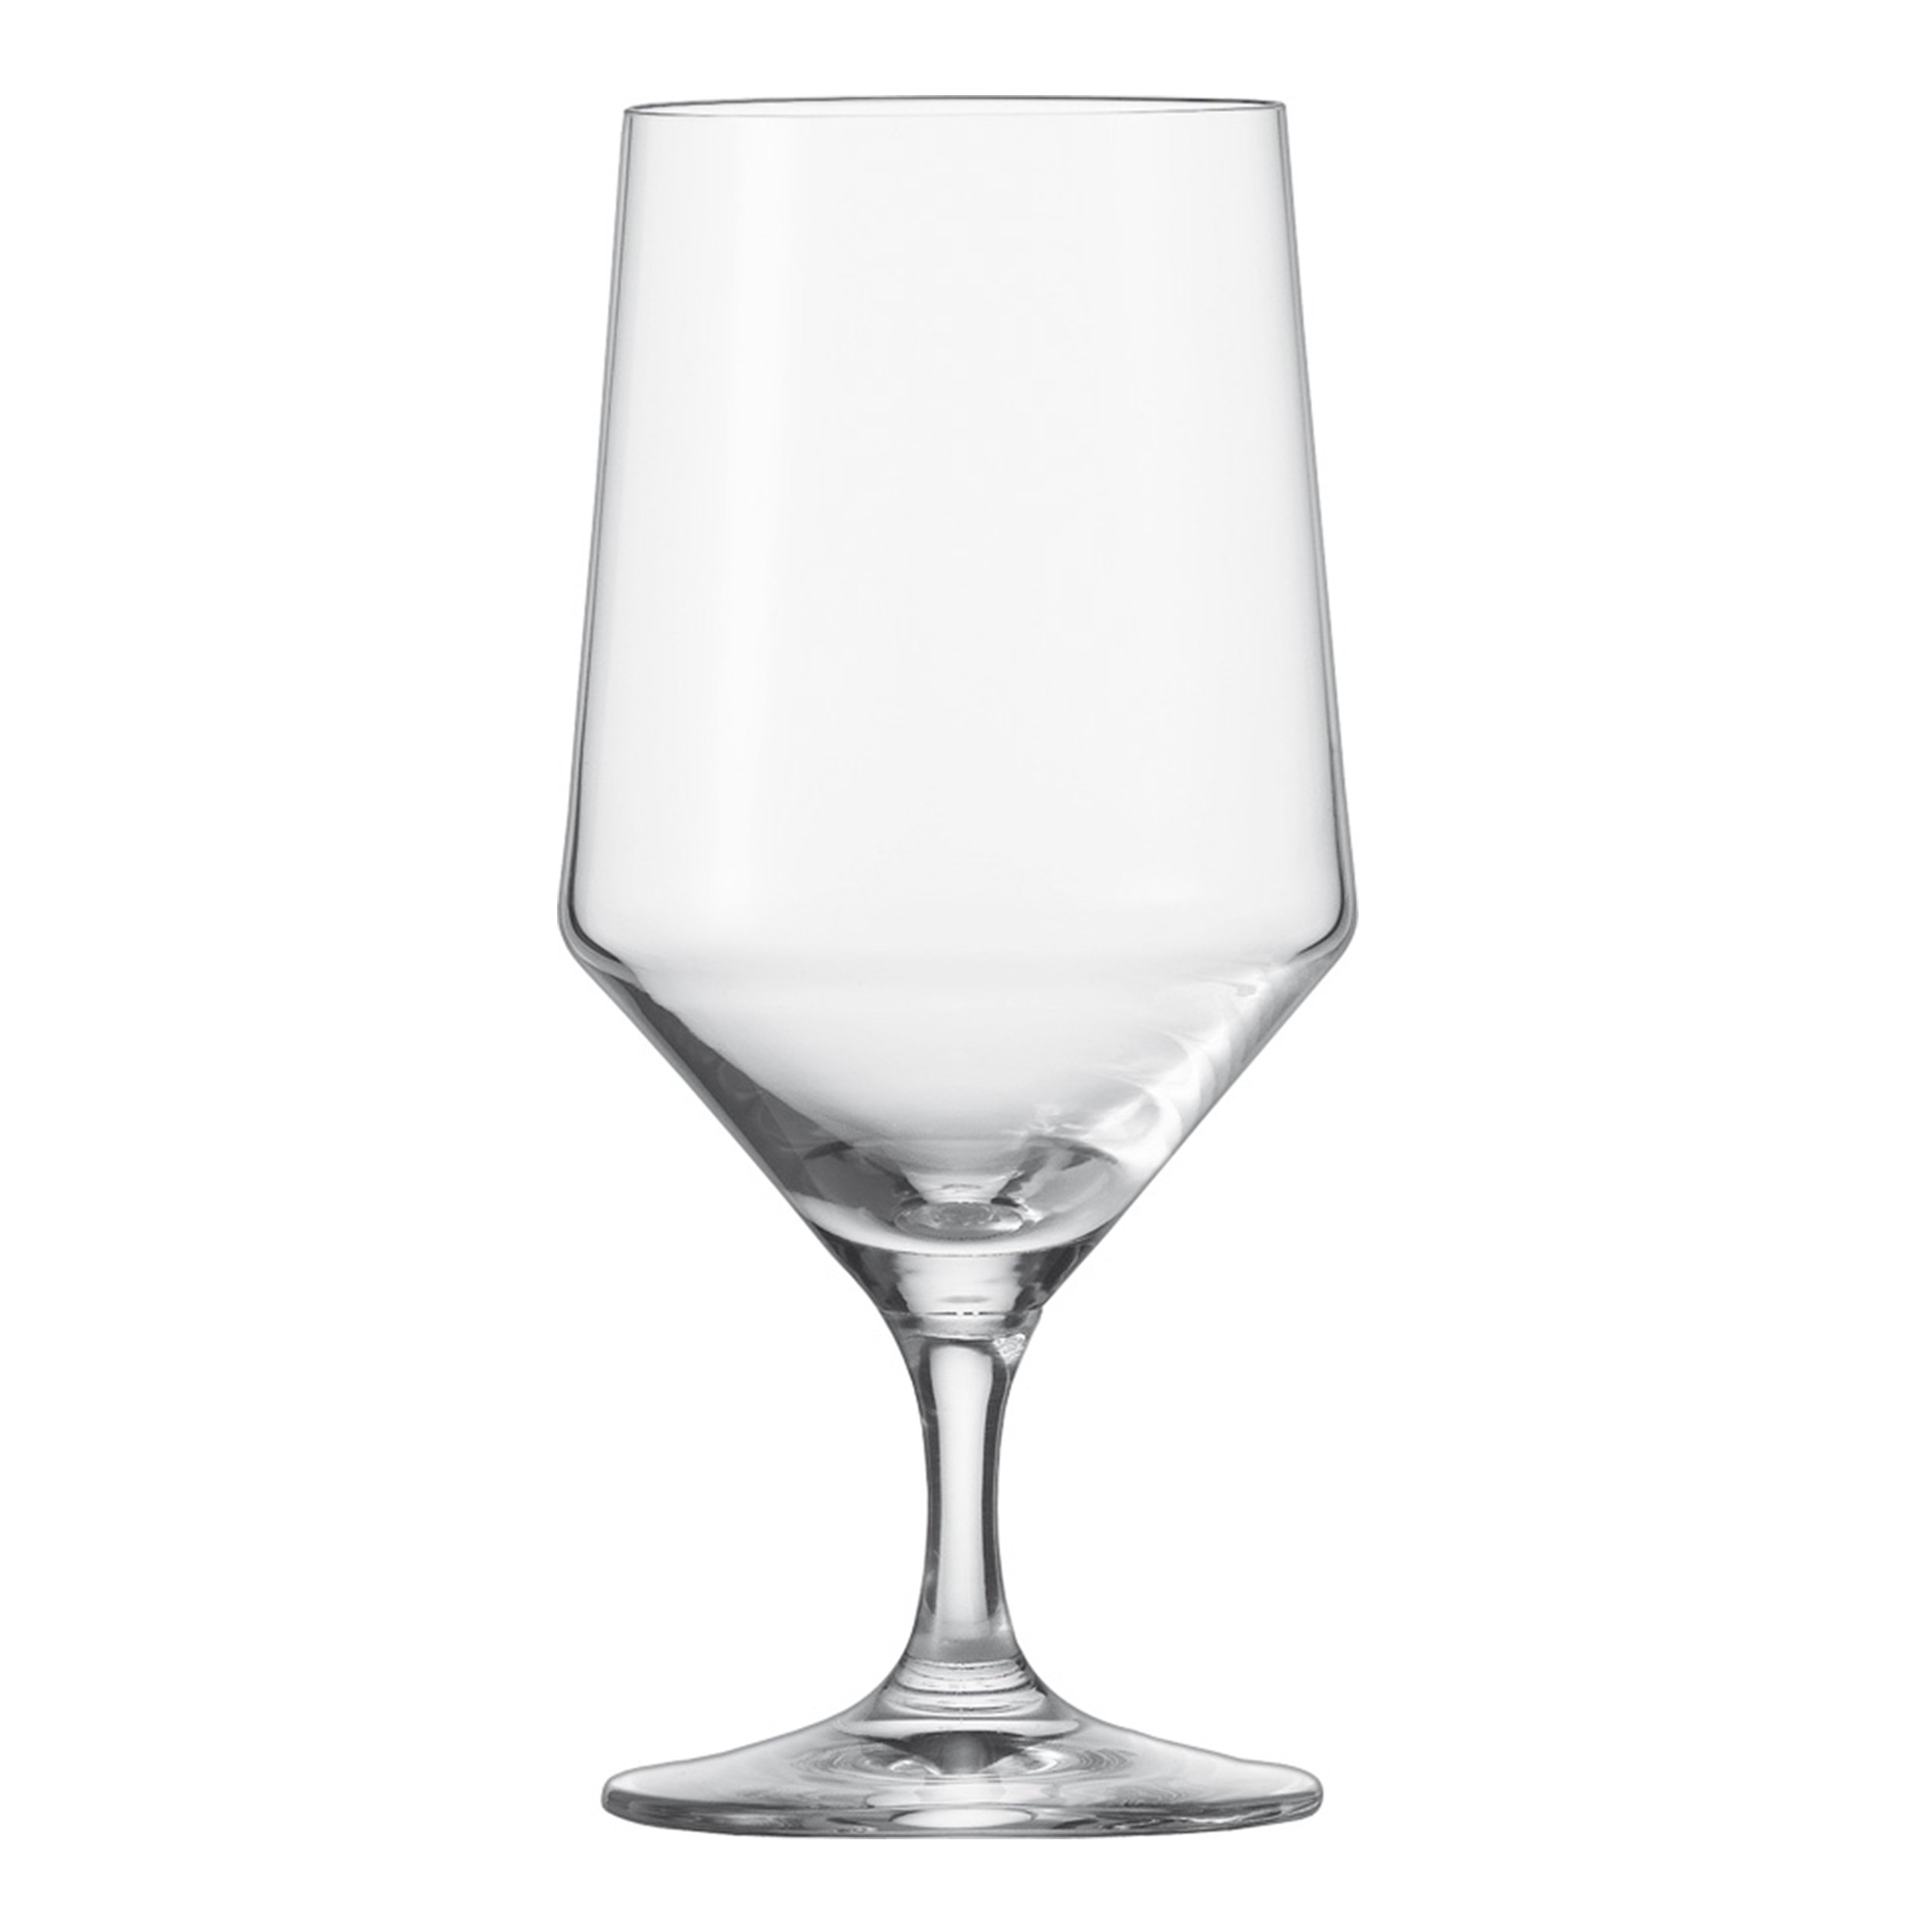 Schott Zwiesel Water Glass 32, 6-Set, Pure, Glass, Form 8545, 451 ml, 112842